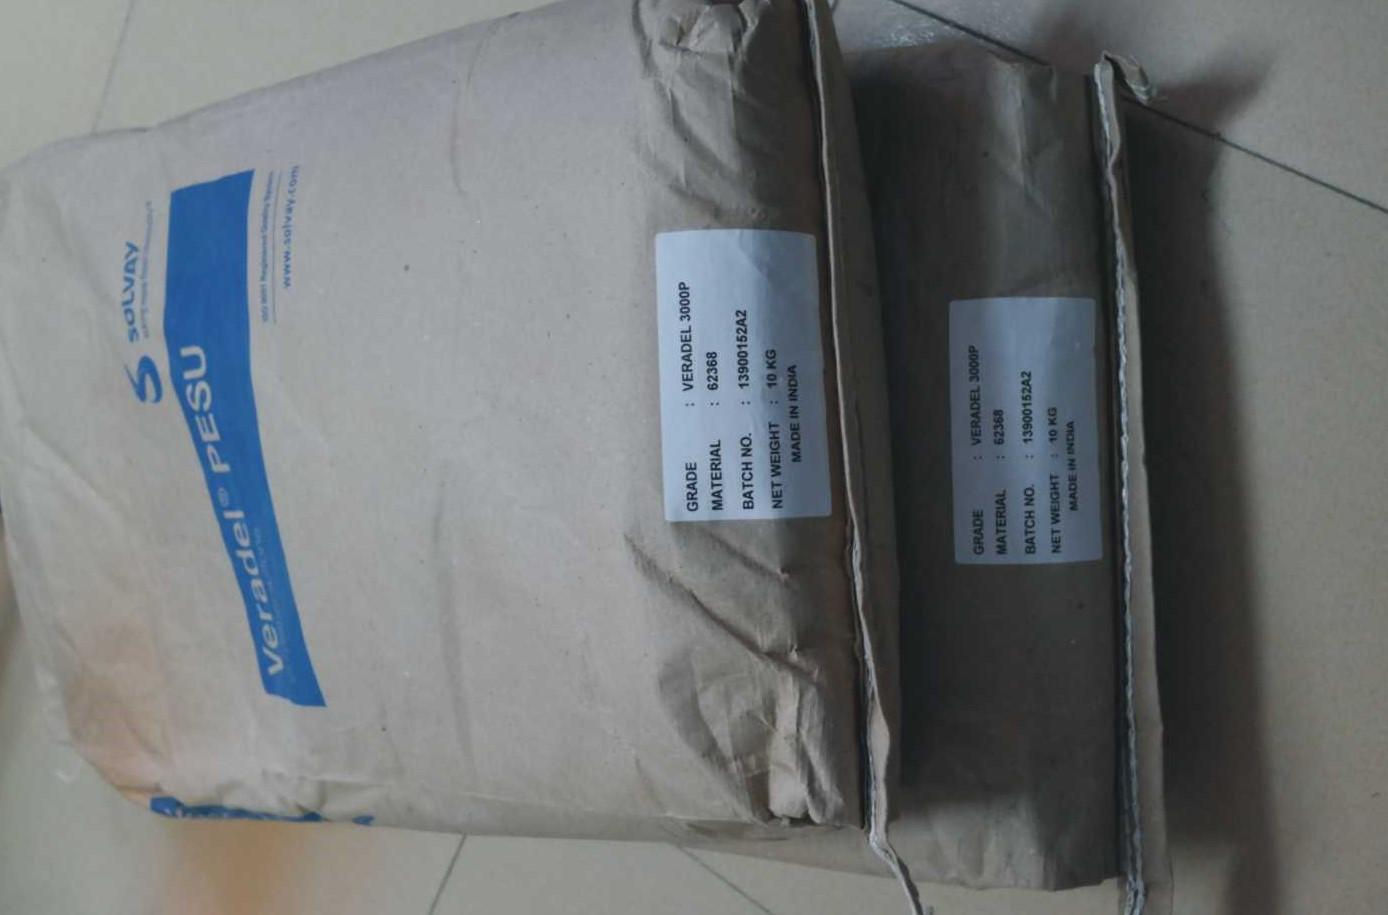 PESU Powders Veradel 3000P